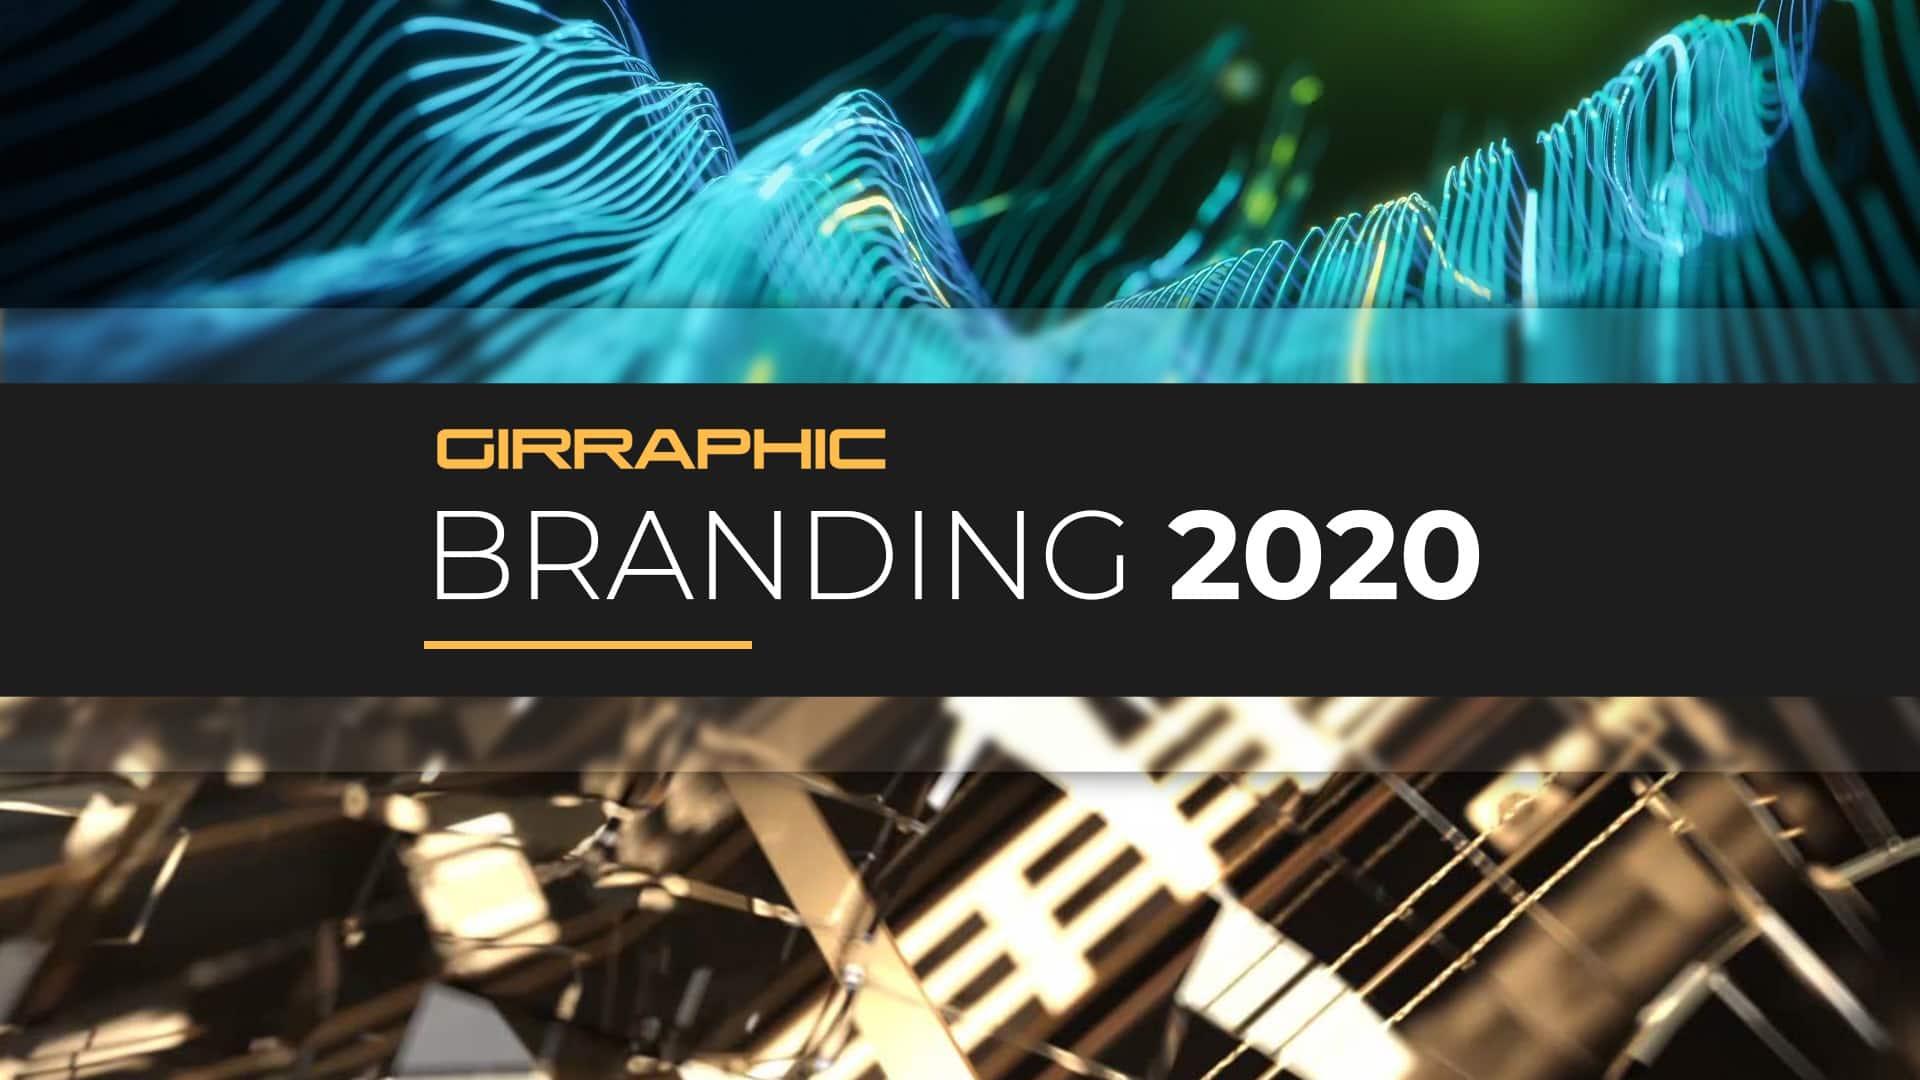 Girraphic Branding 2020 Cover